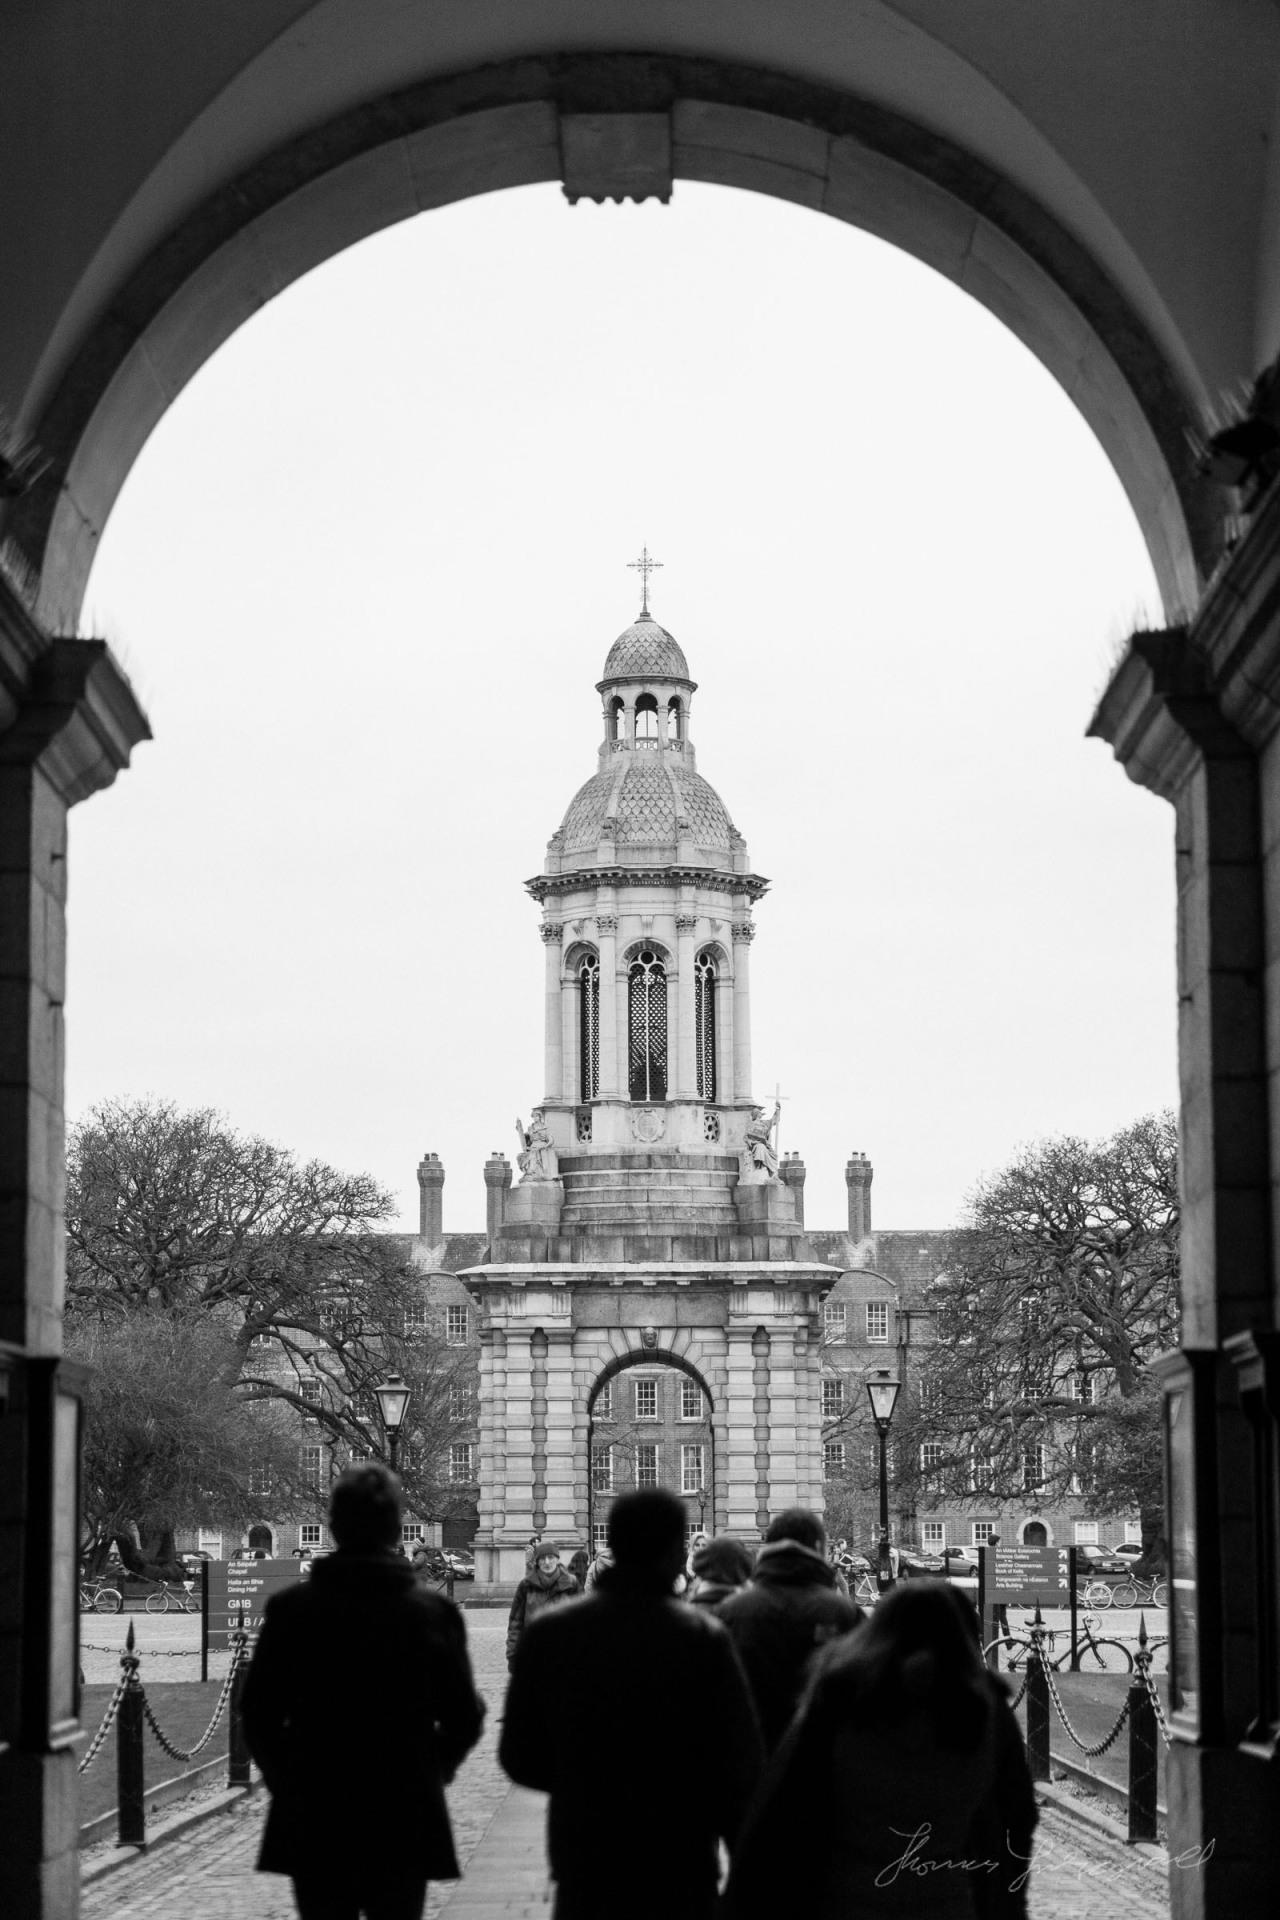 A scene through Trinity College Dublin's famous doorway